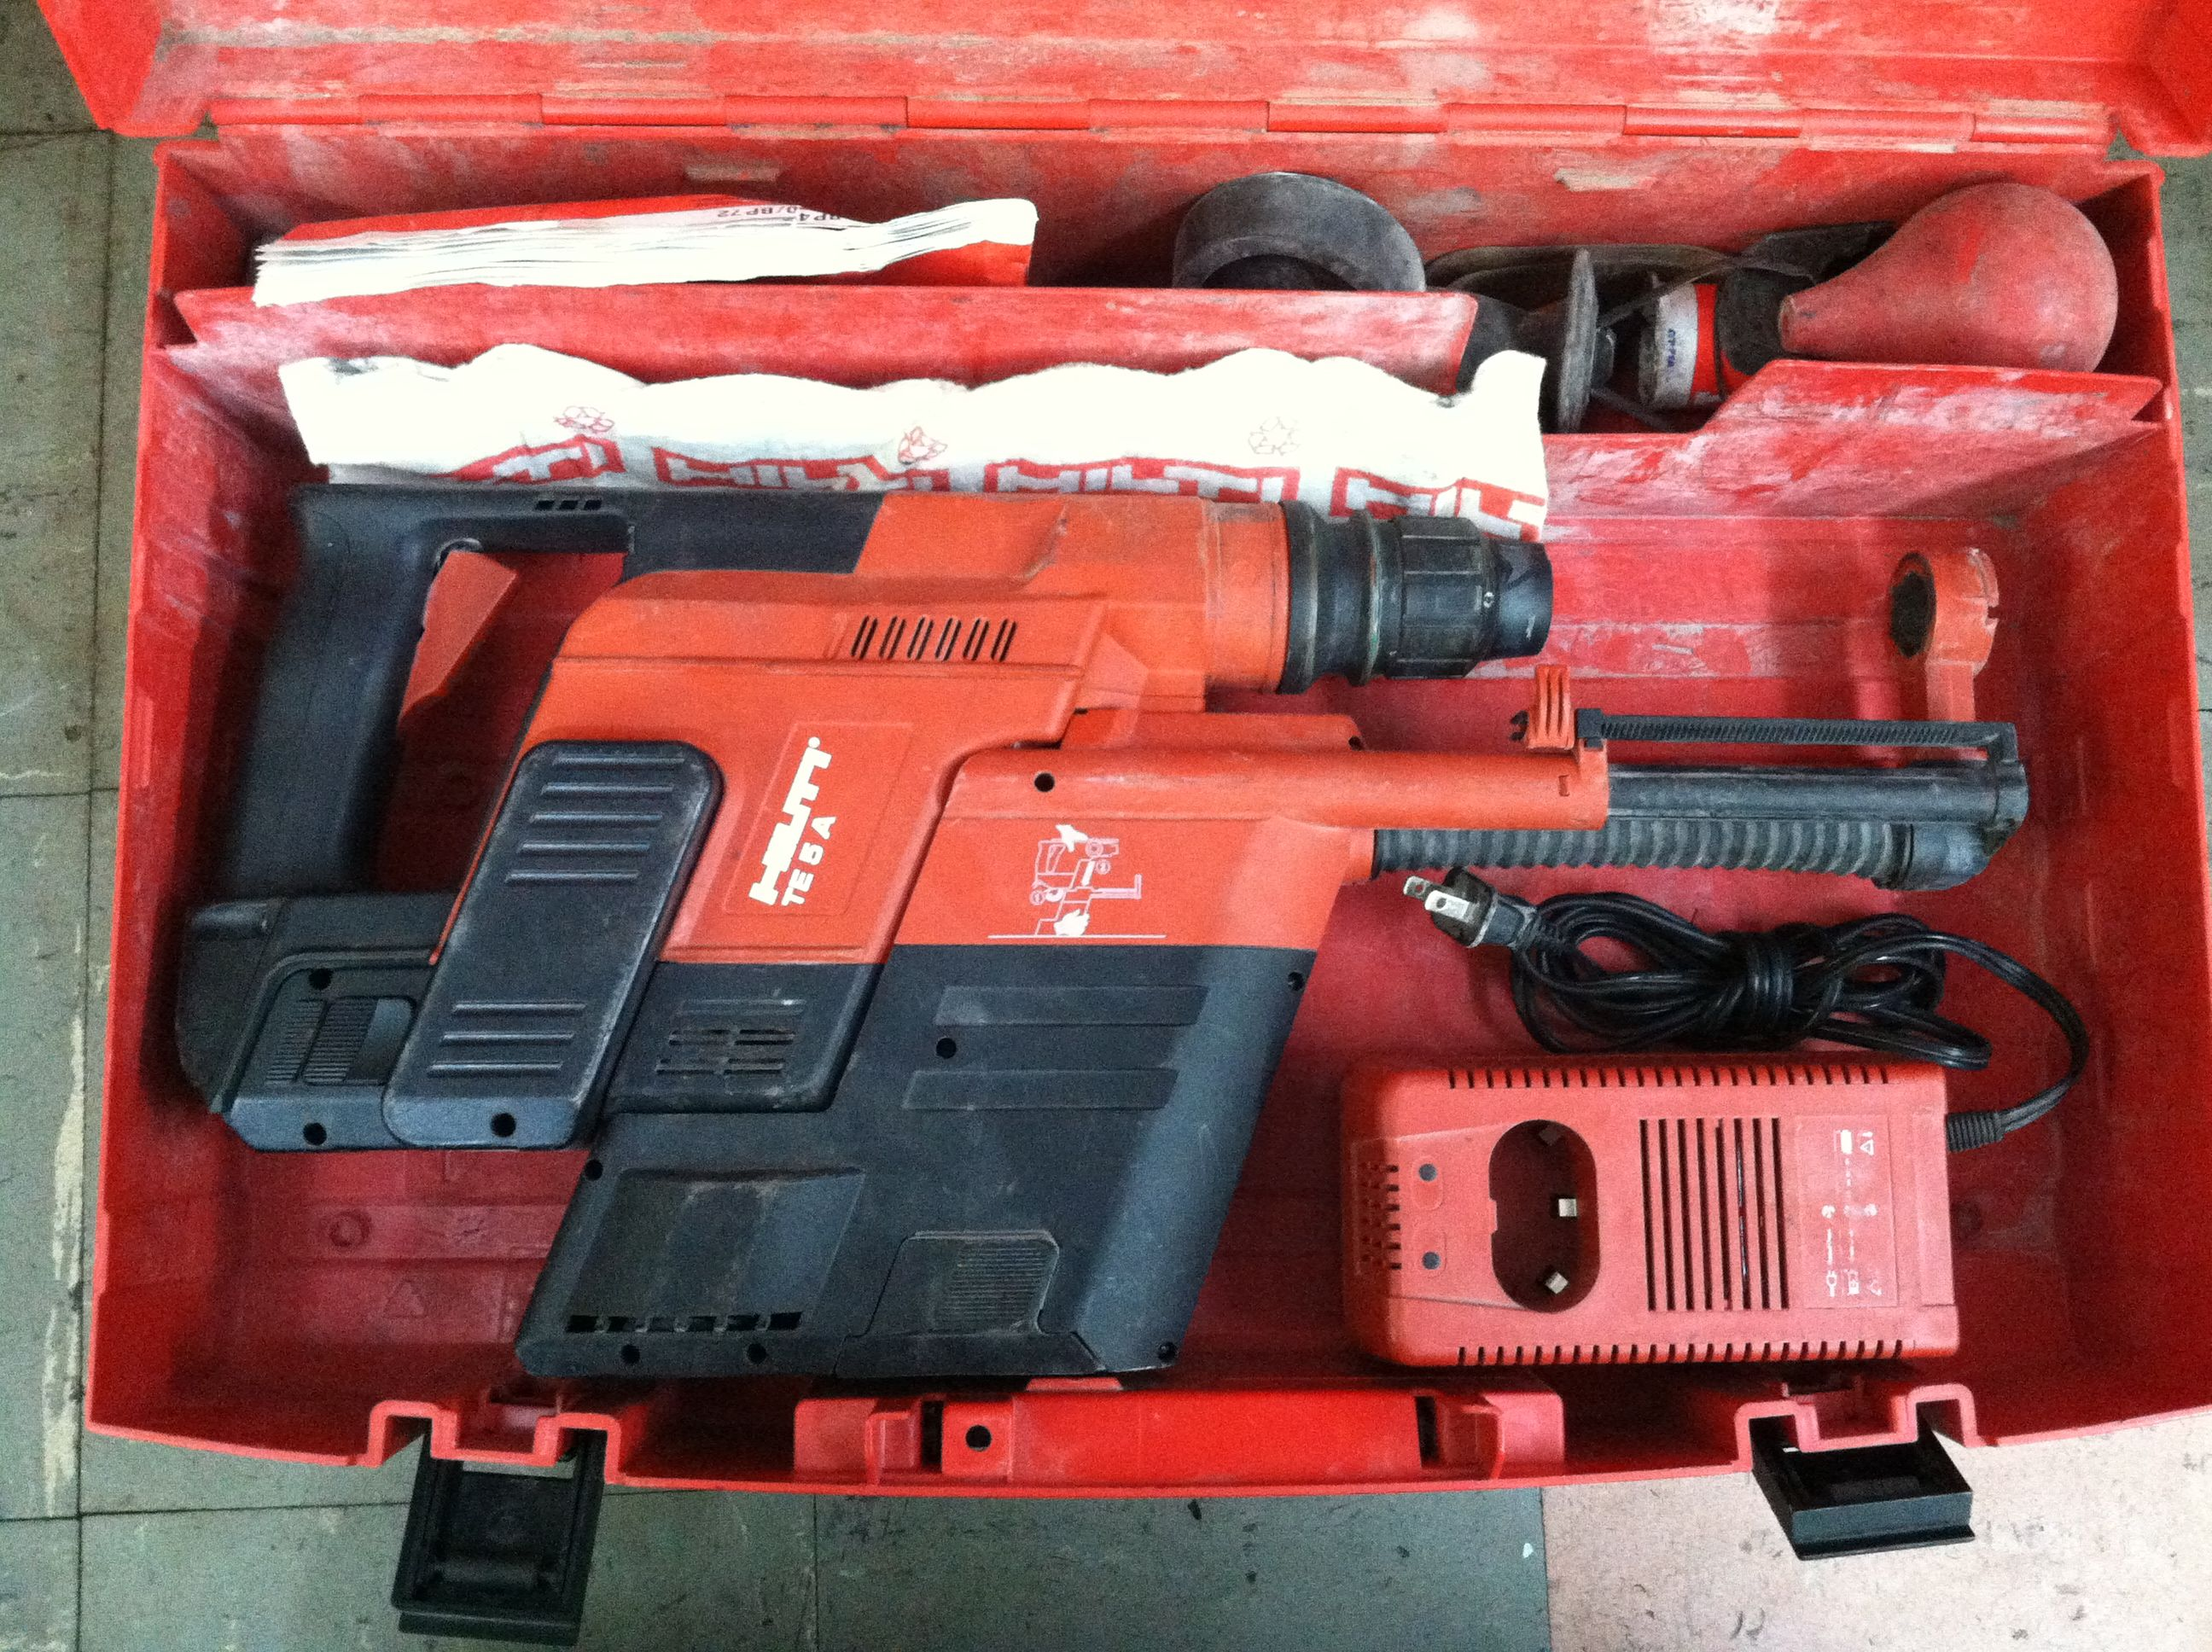 Hilti TE5A 24v cordless drill with TE5DRS dust removal attachment ...